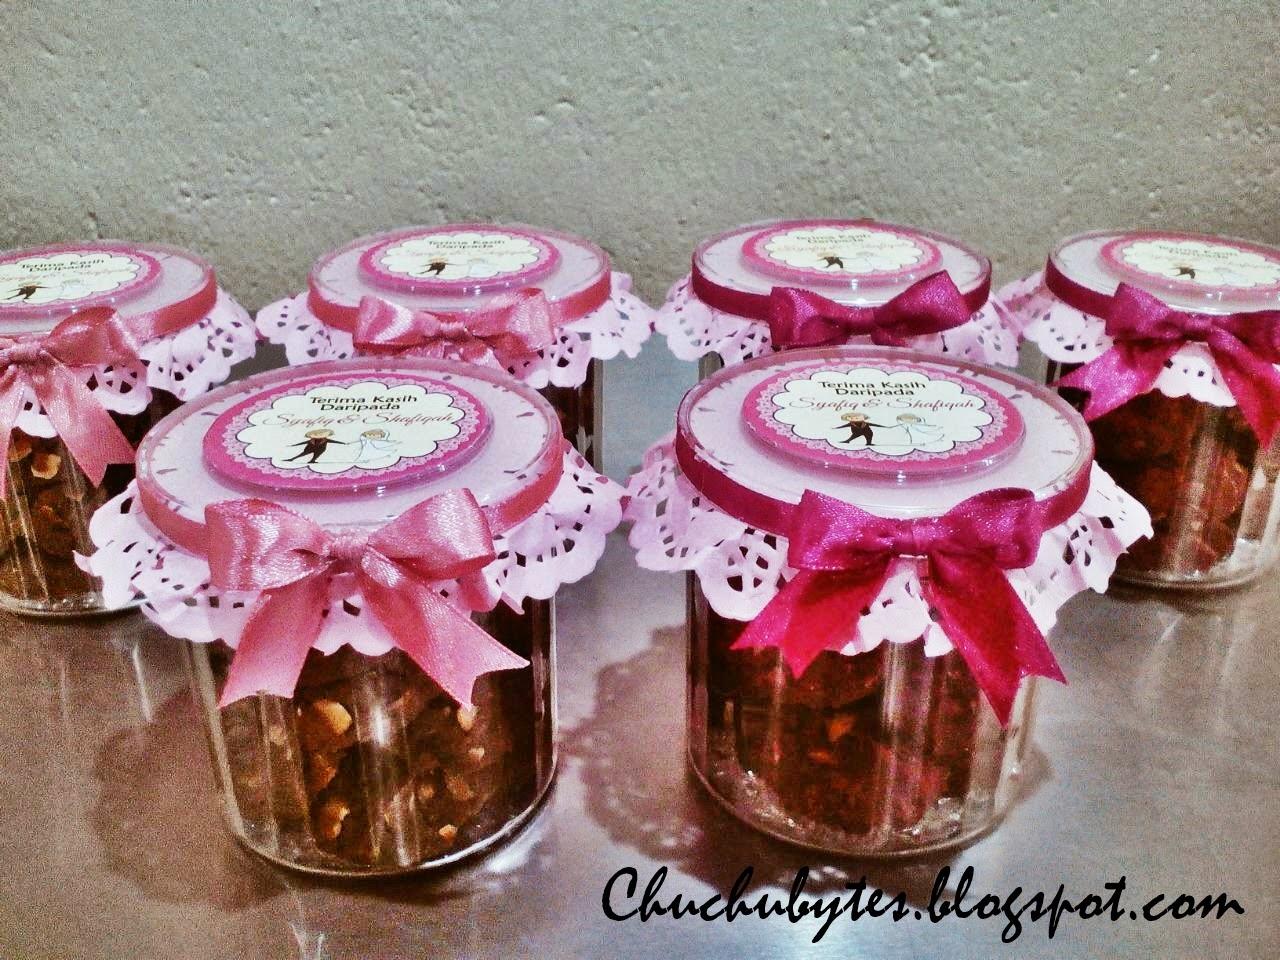 Chuchubytes: Chocolate Chip Cookies for wedding doorgift!